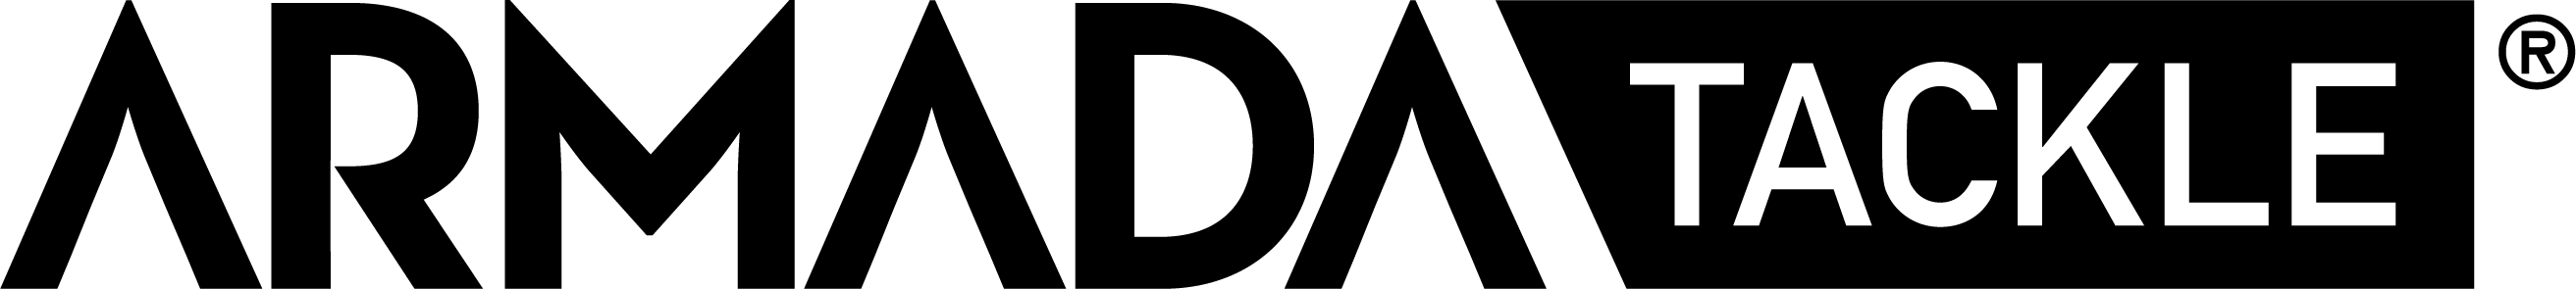 Armada Tackle logo black